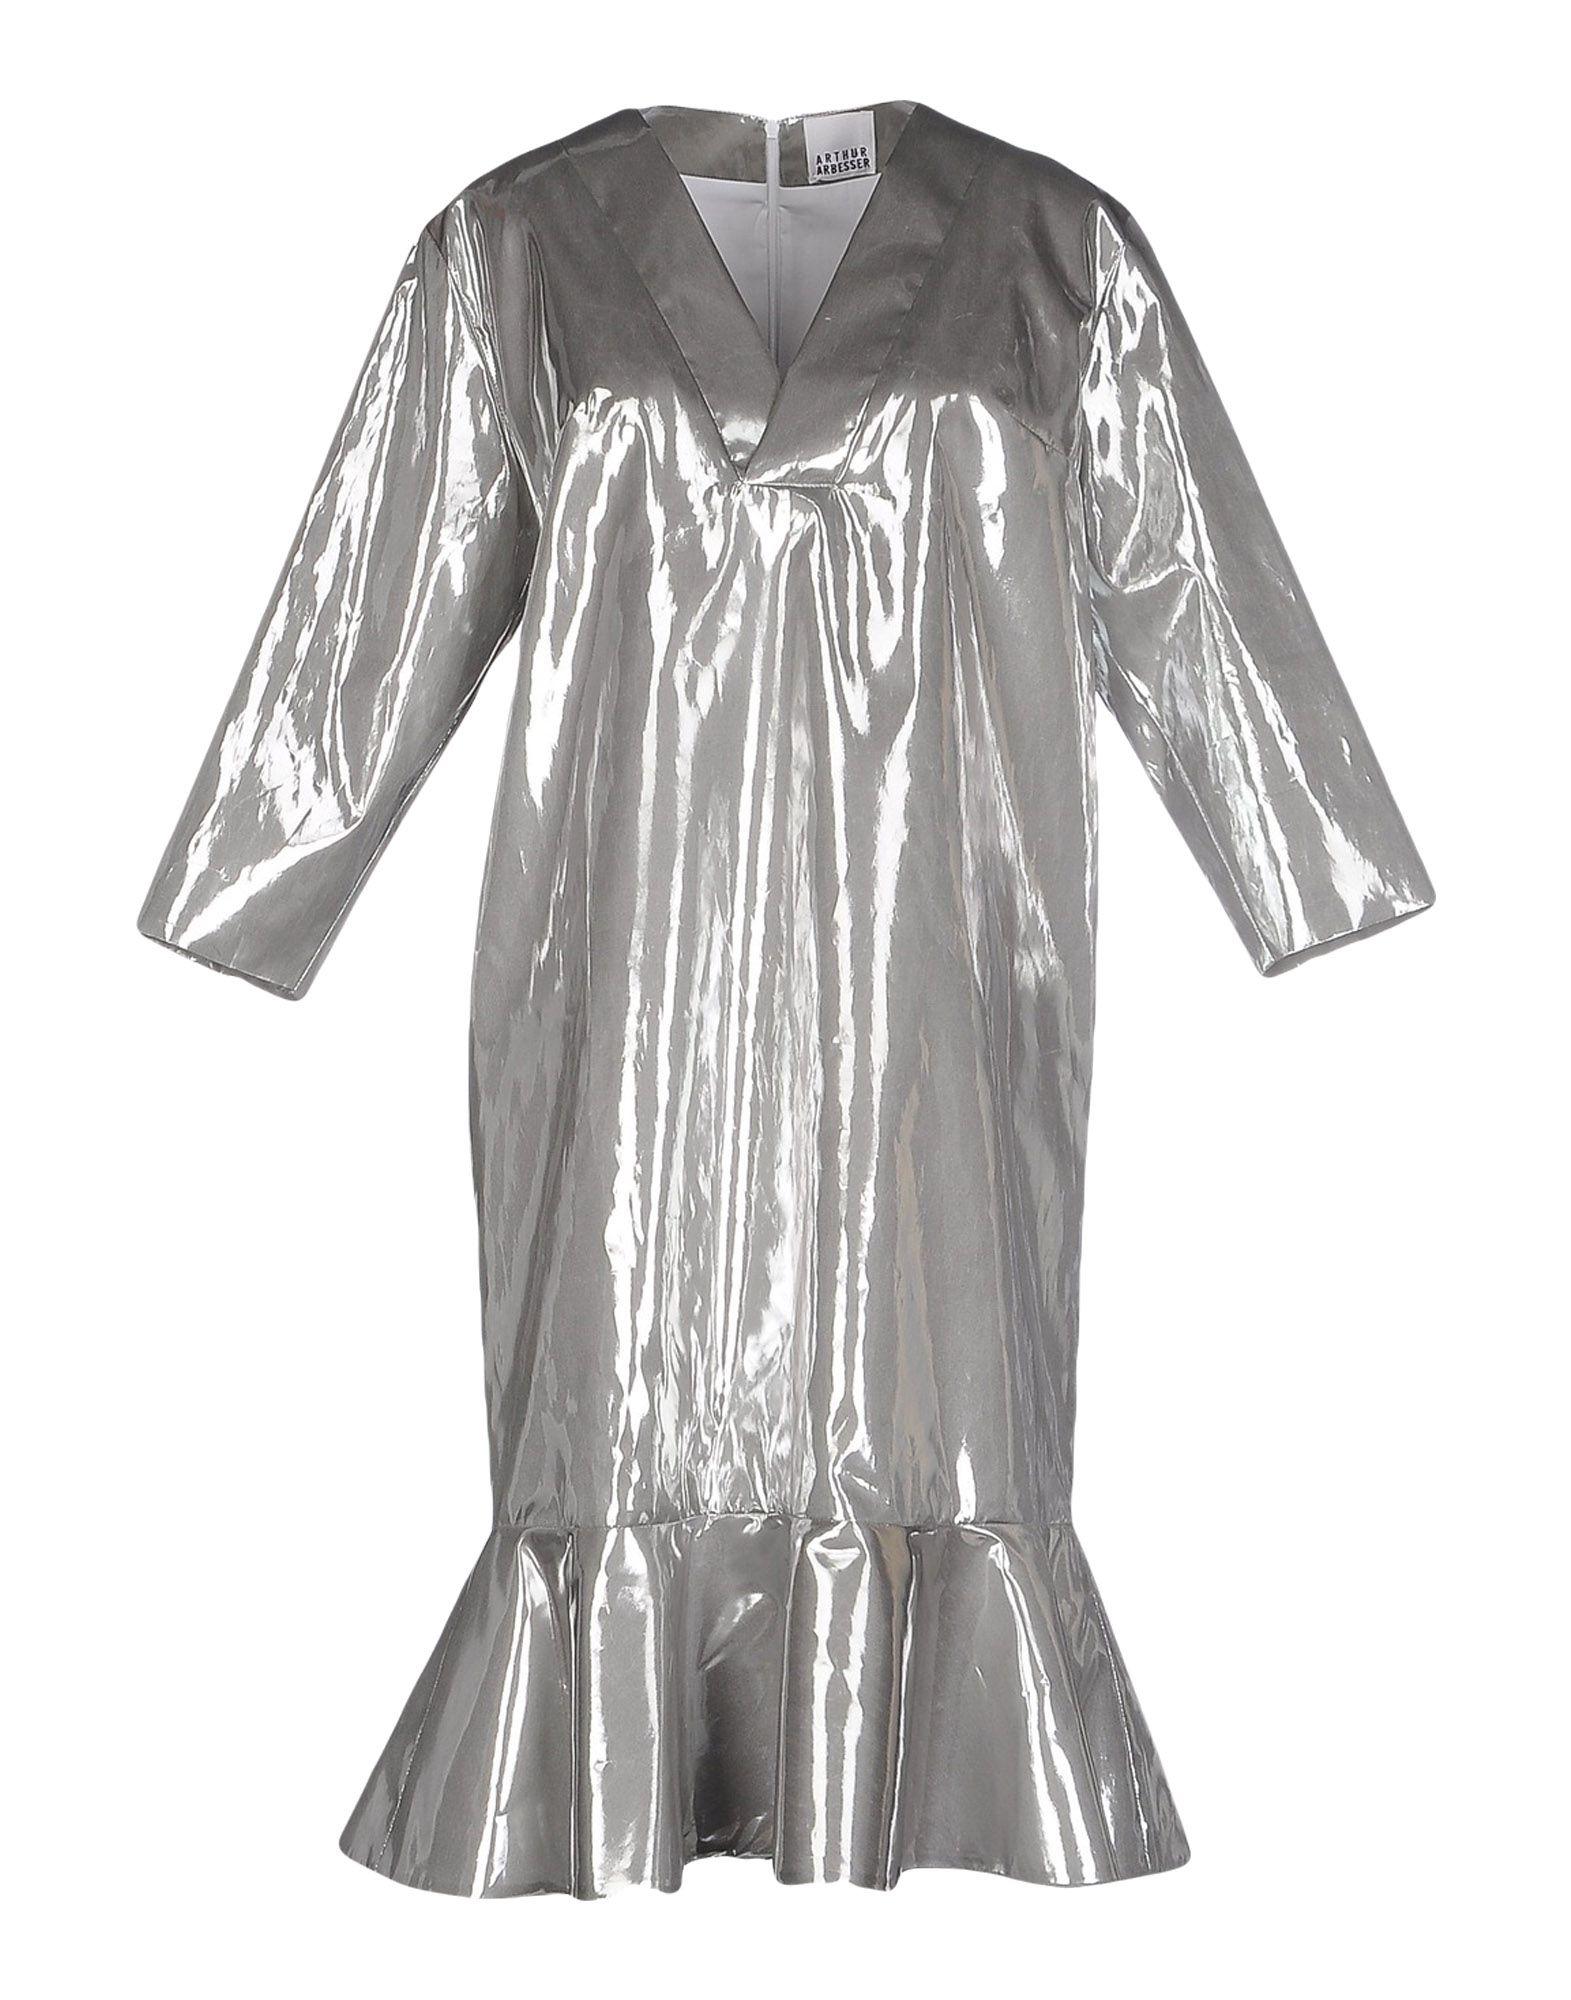 ARTHUR ARBESSER Short Dress in Silver